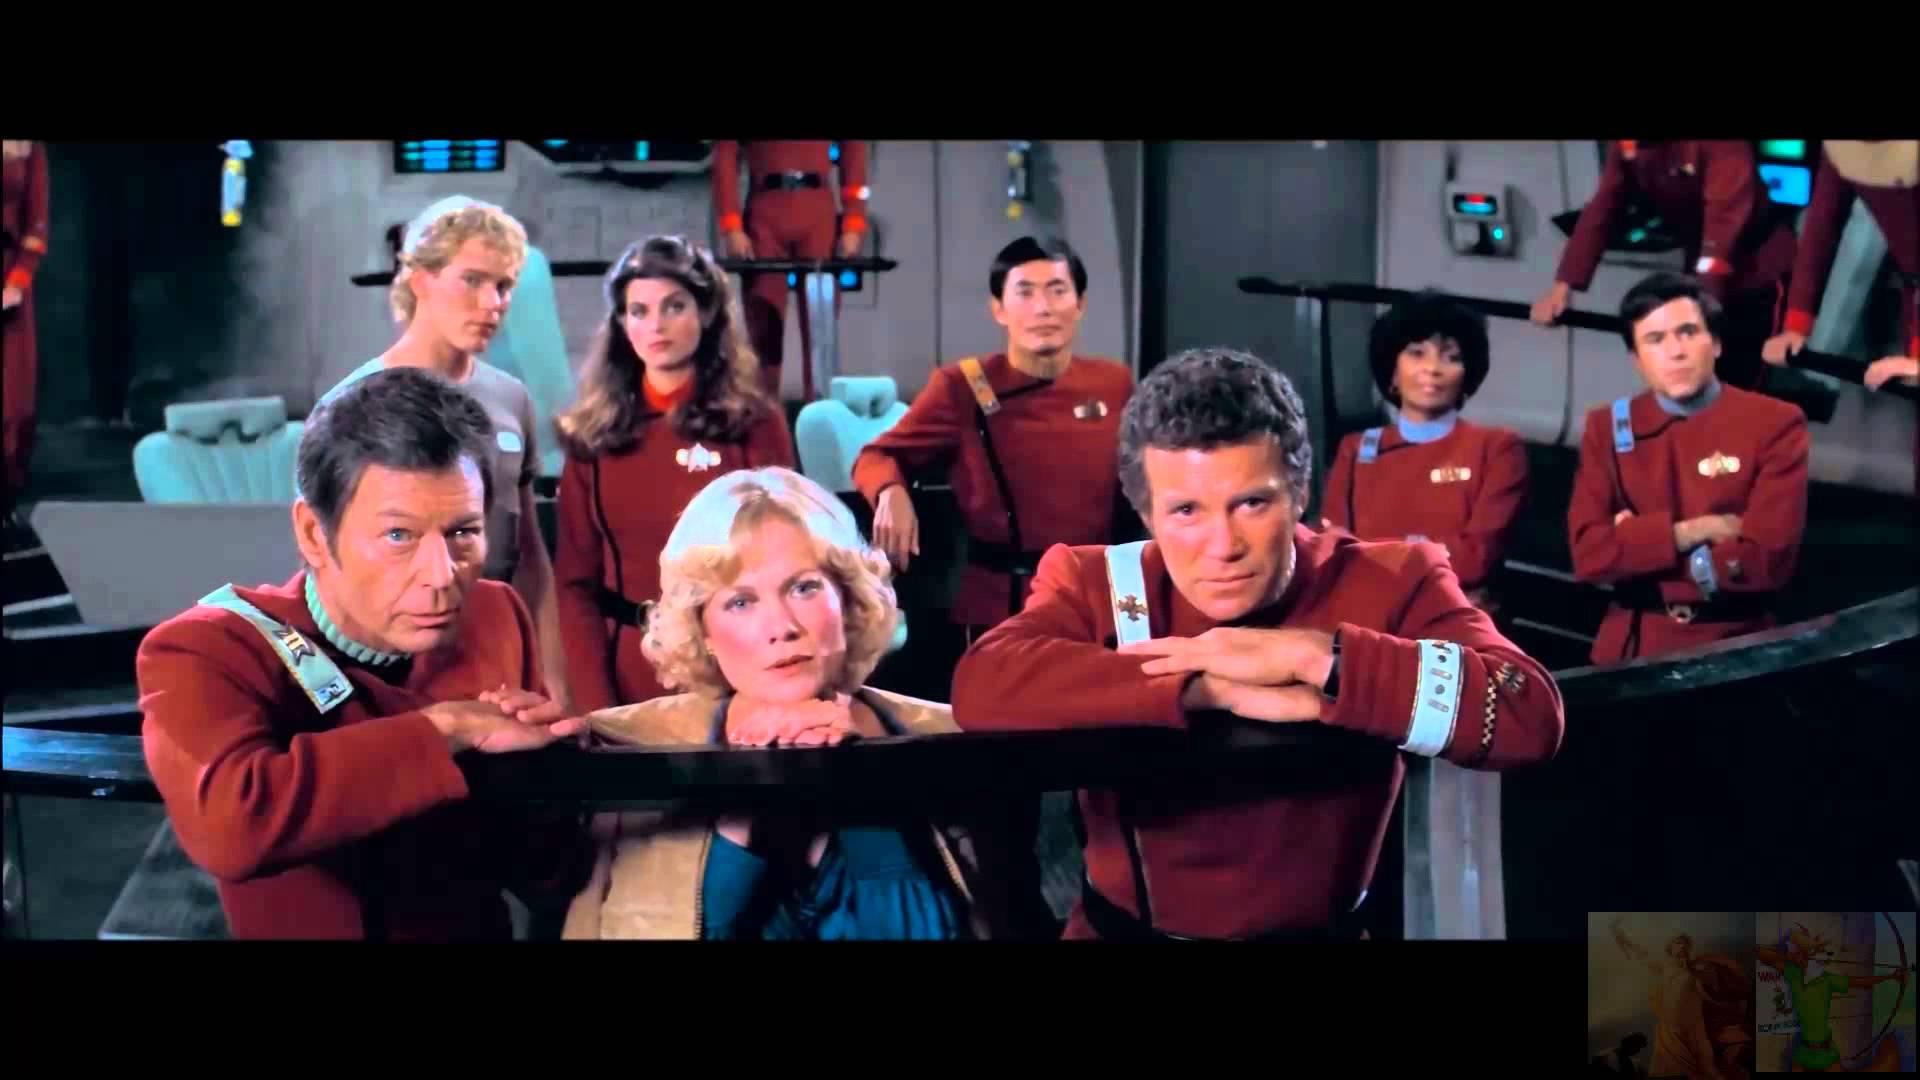 1920x1080 > Star Trek II: The Wrath Of Khan Wallpapers